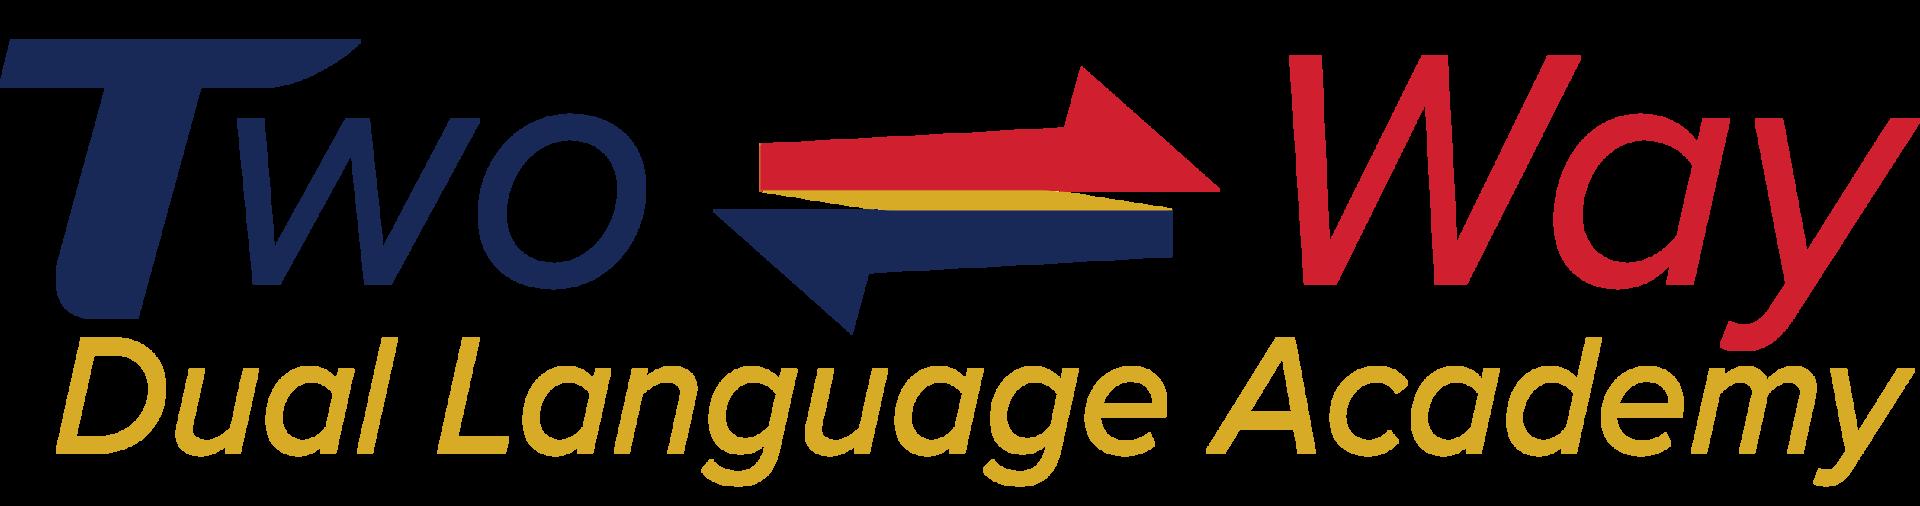 Two-way dual language academy logo